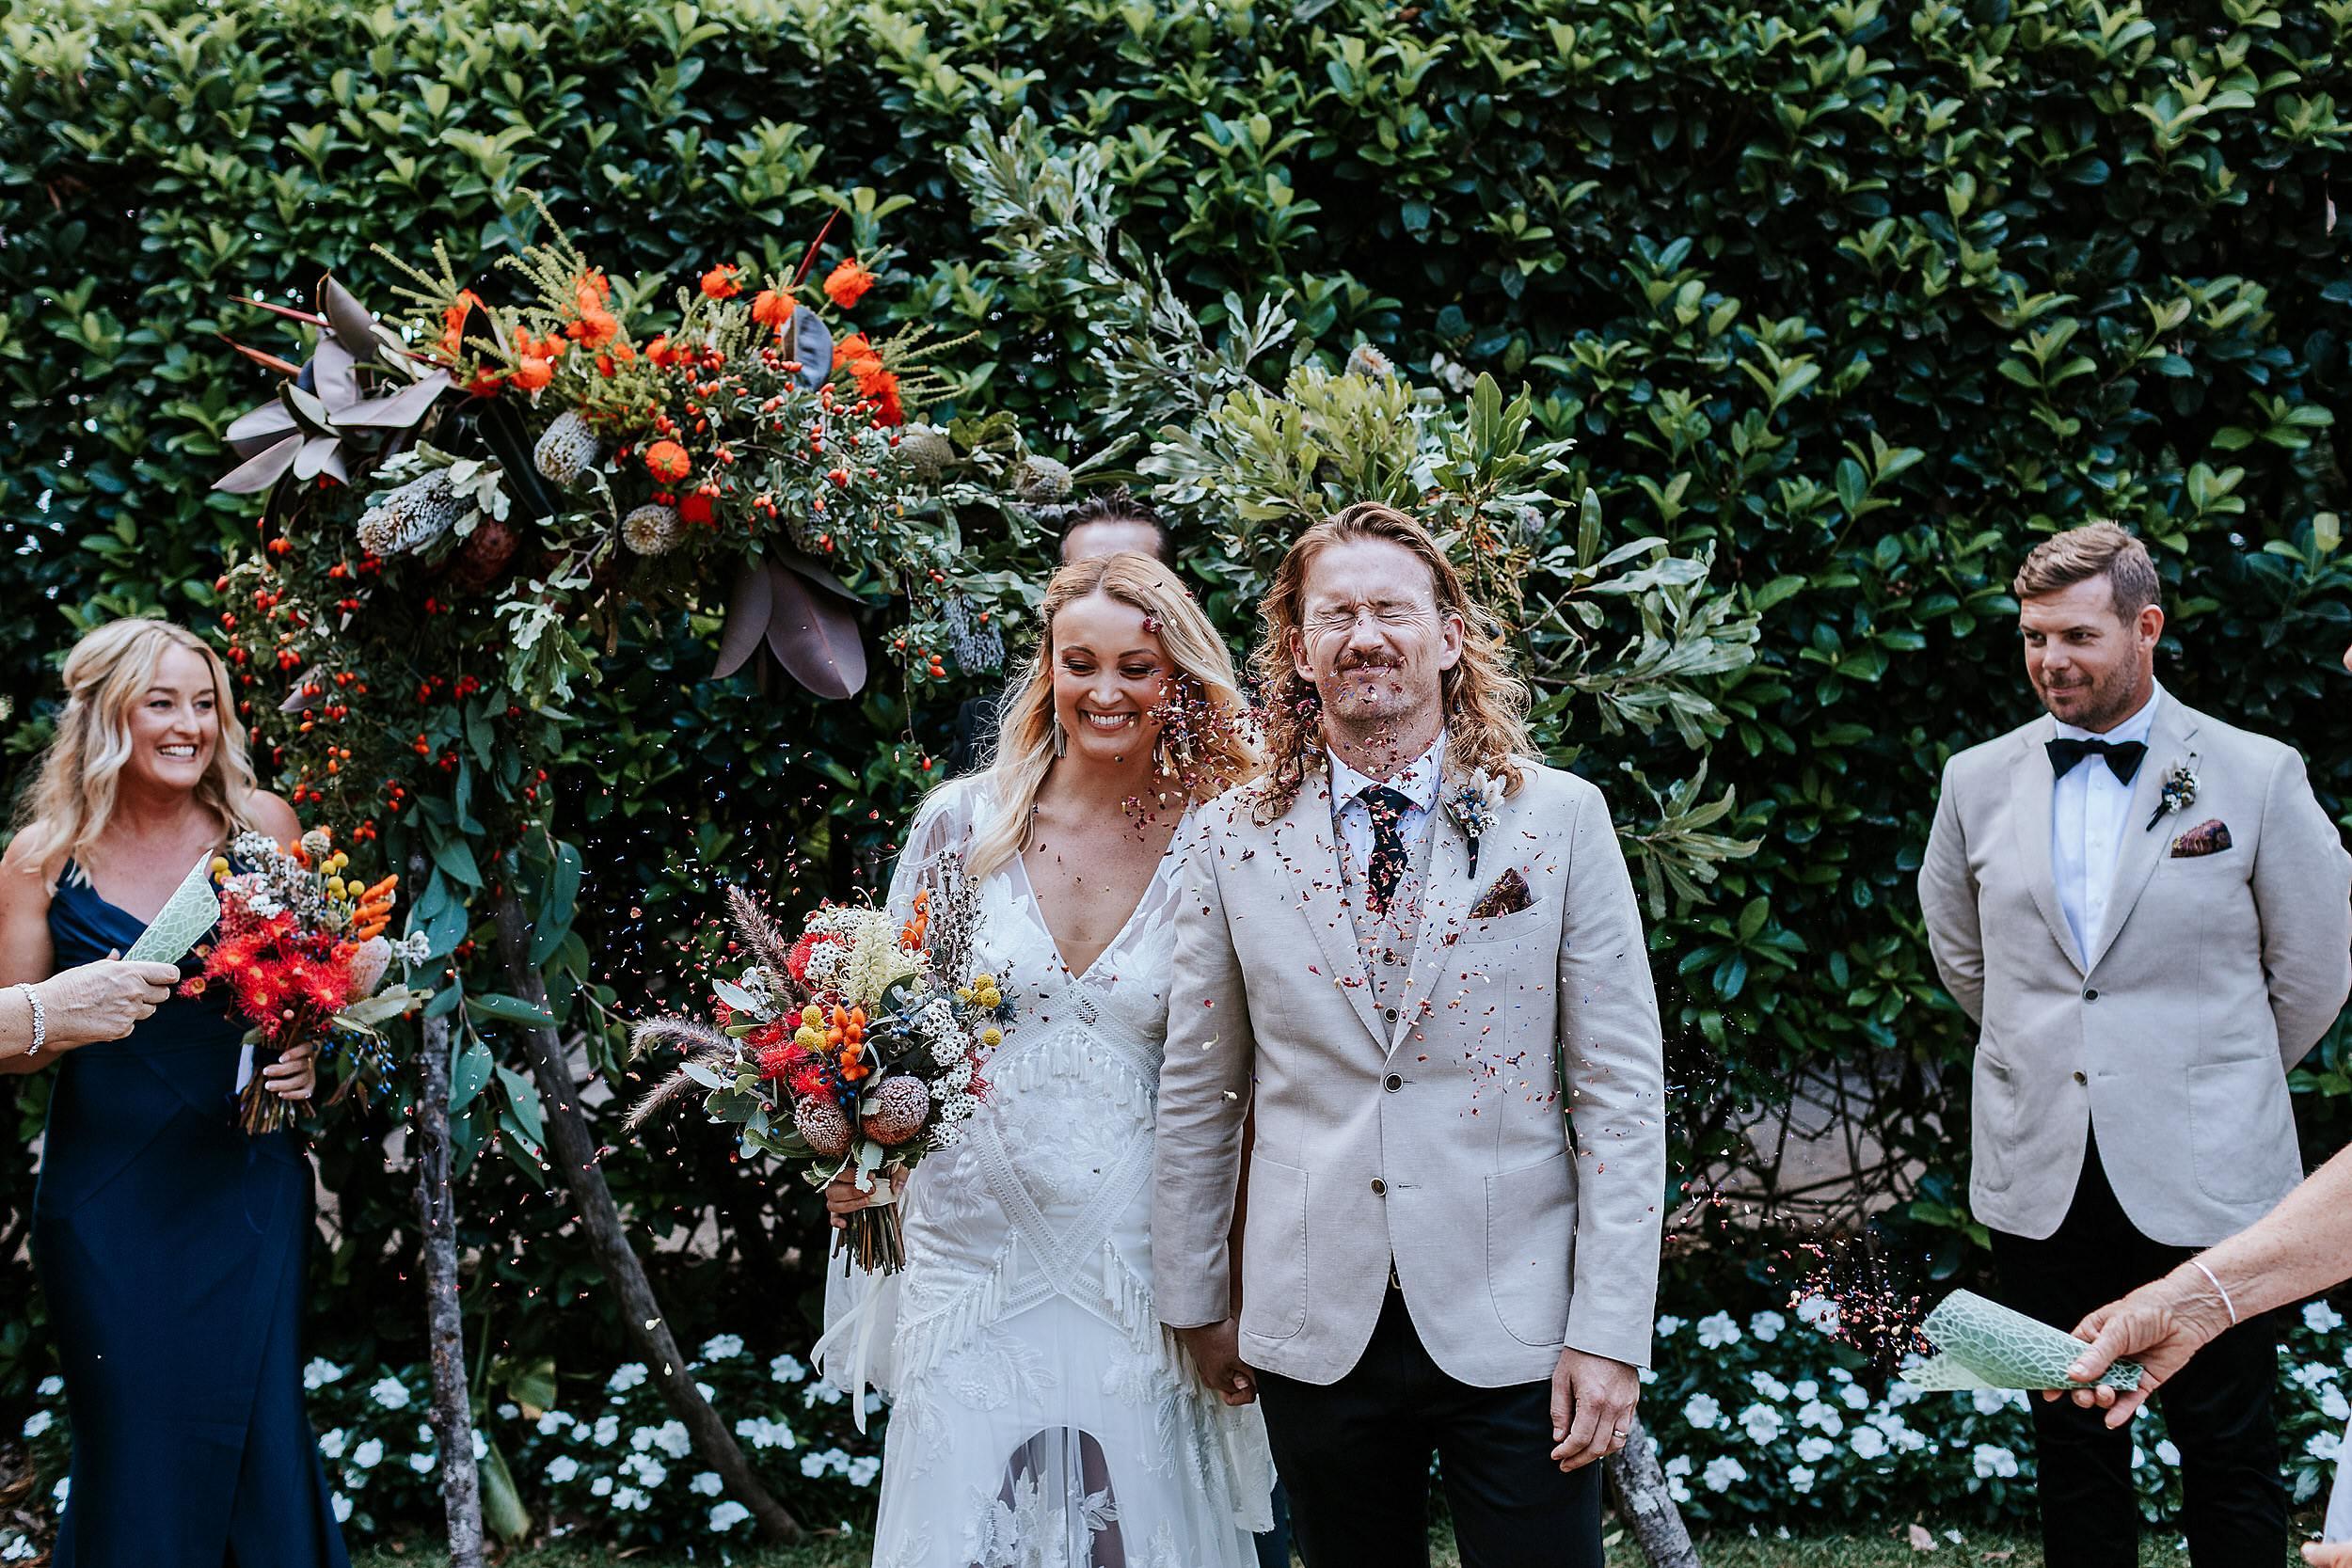 wedding_the_woolshed_steph_zac_0104.jpg